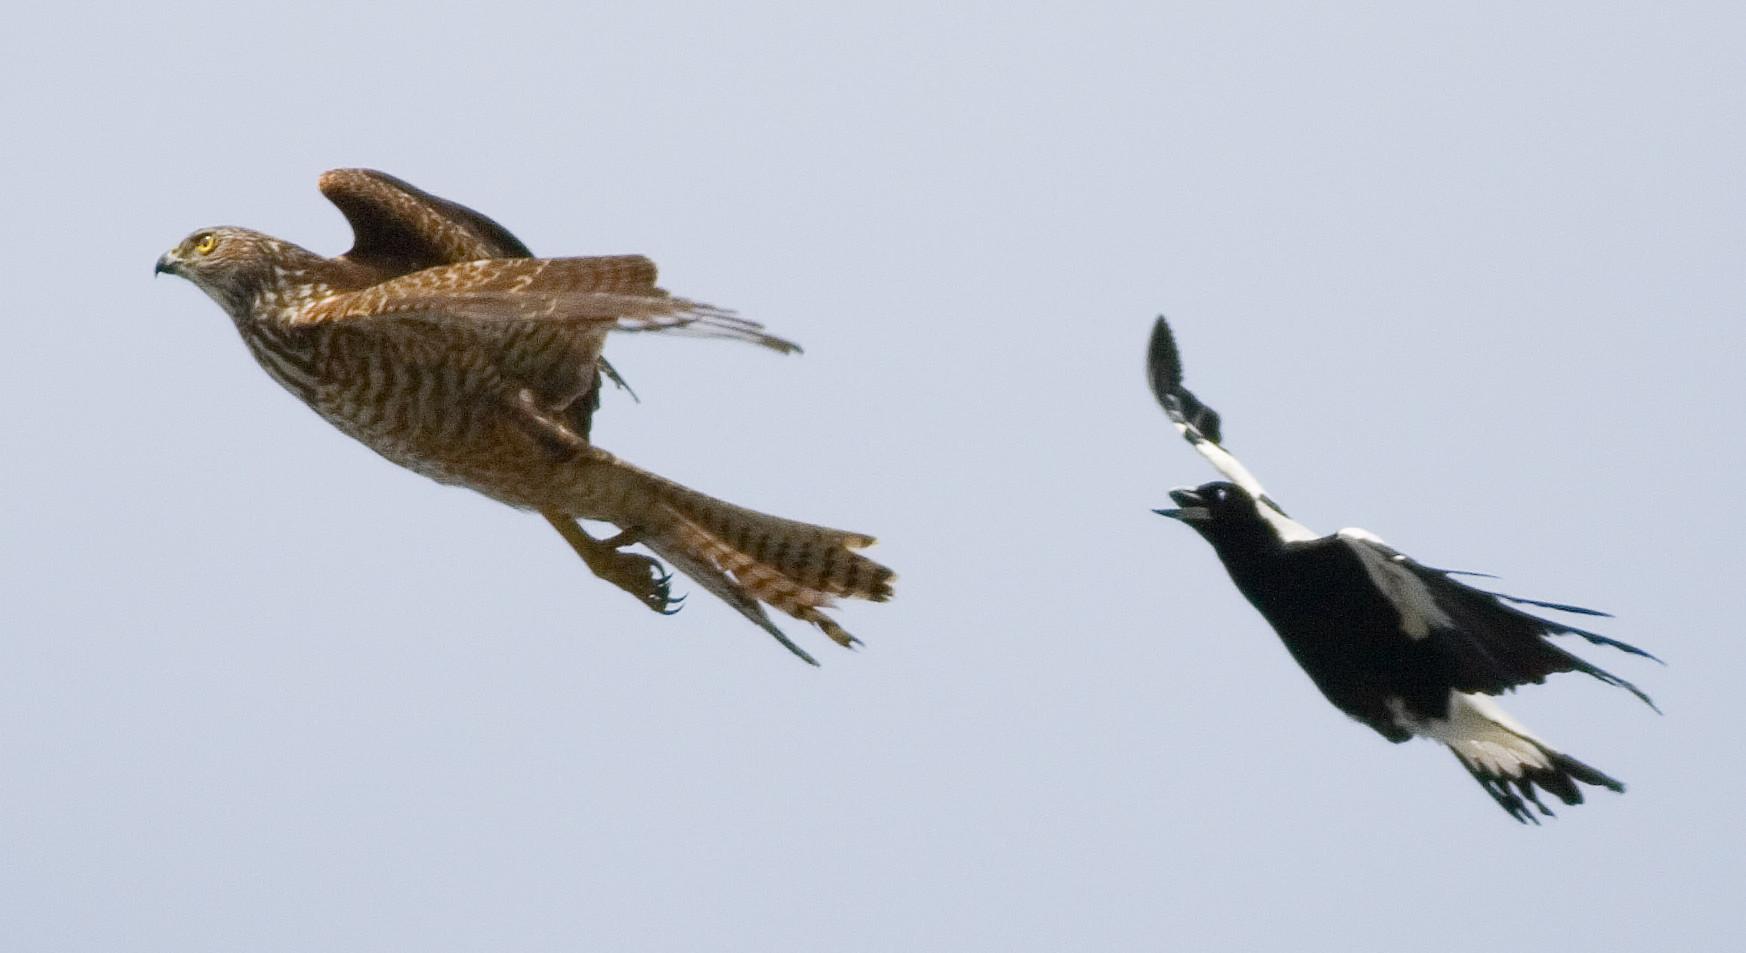 Australian Magpie chasing Brown Goshawk